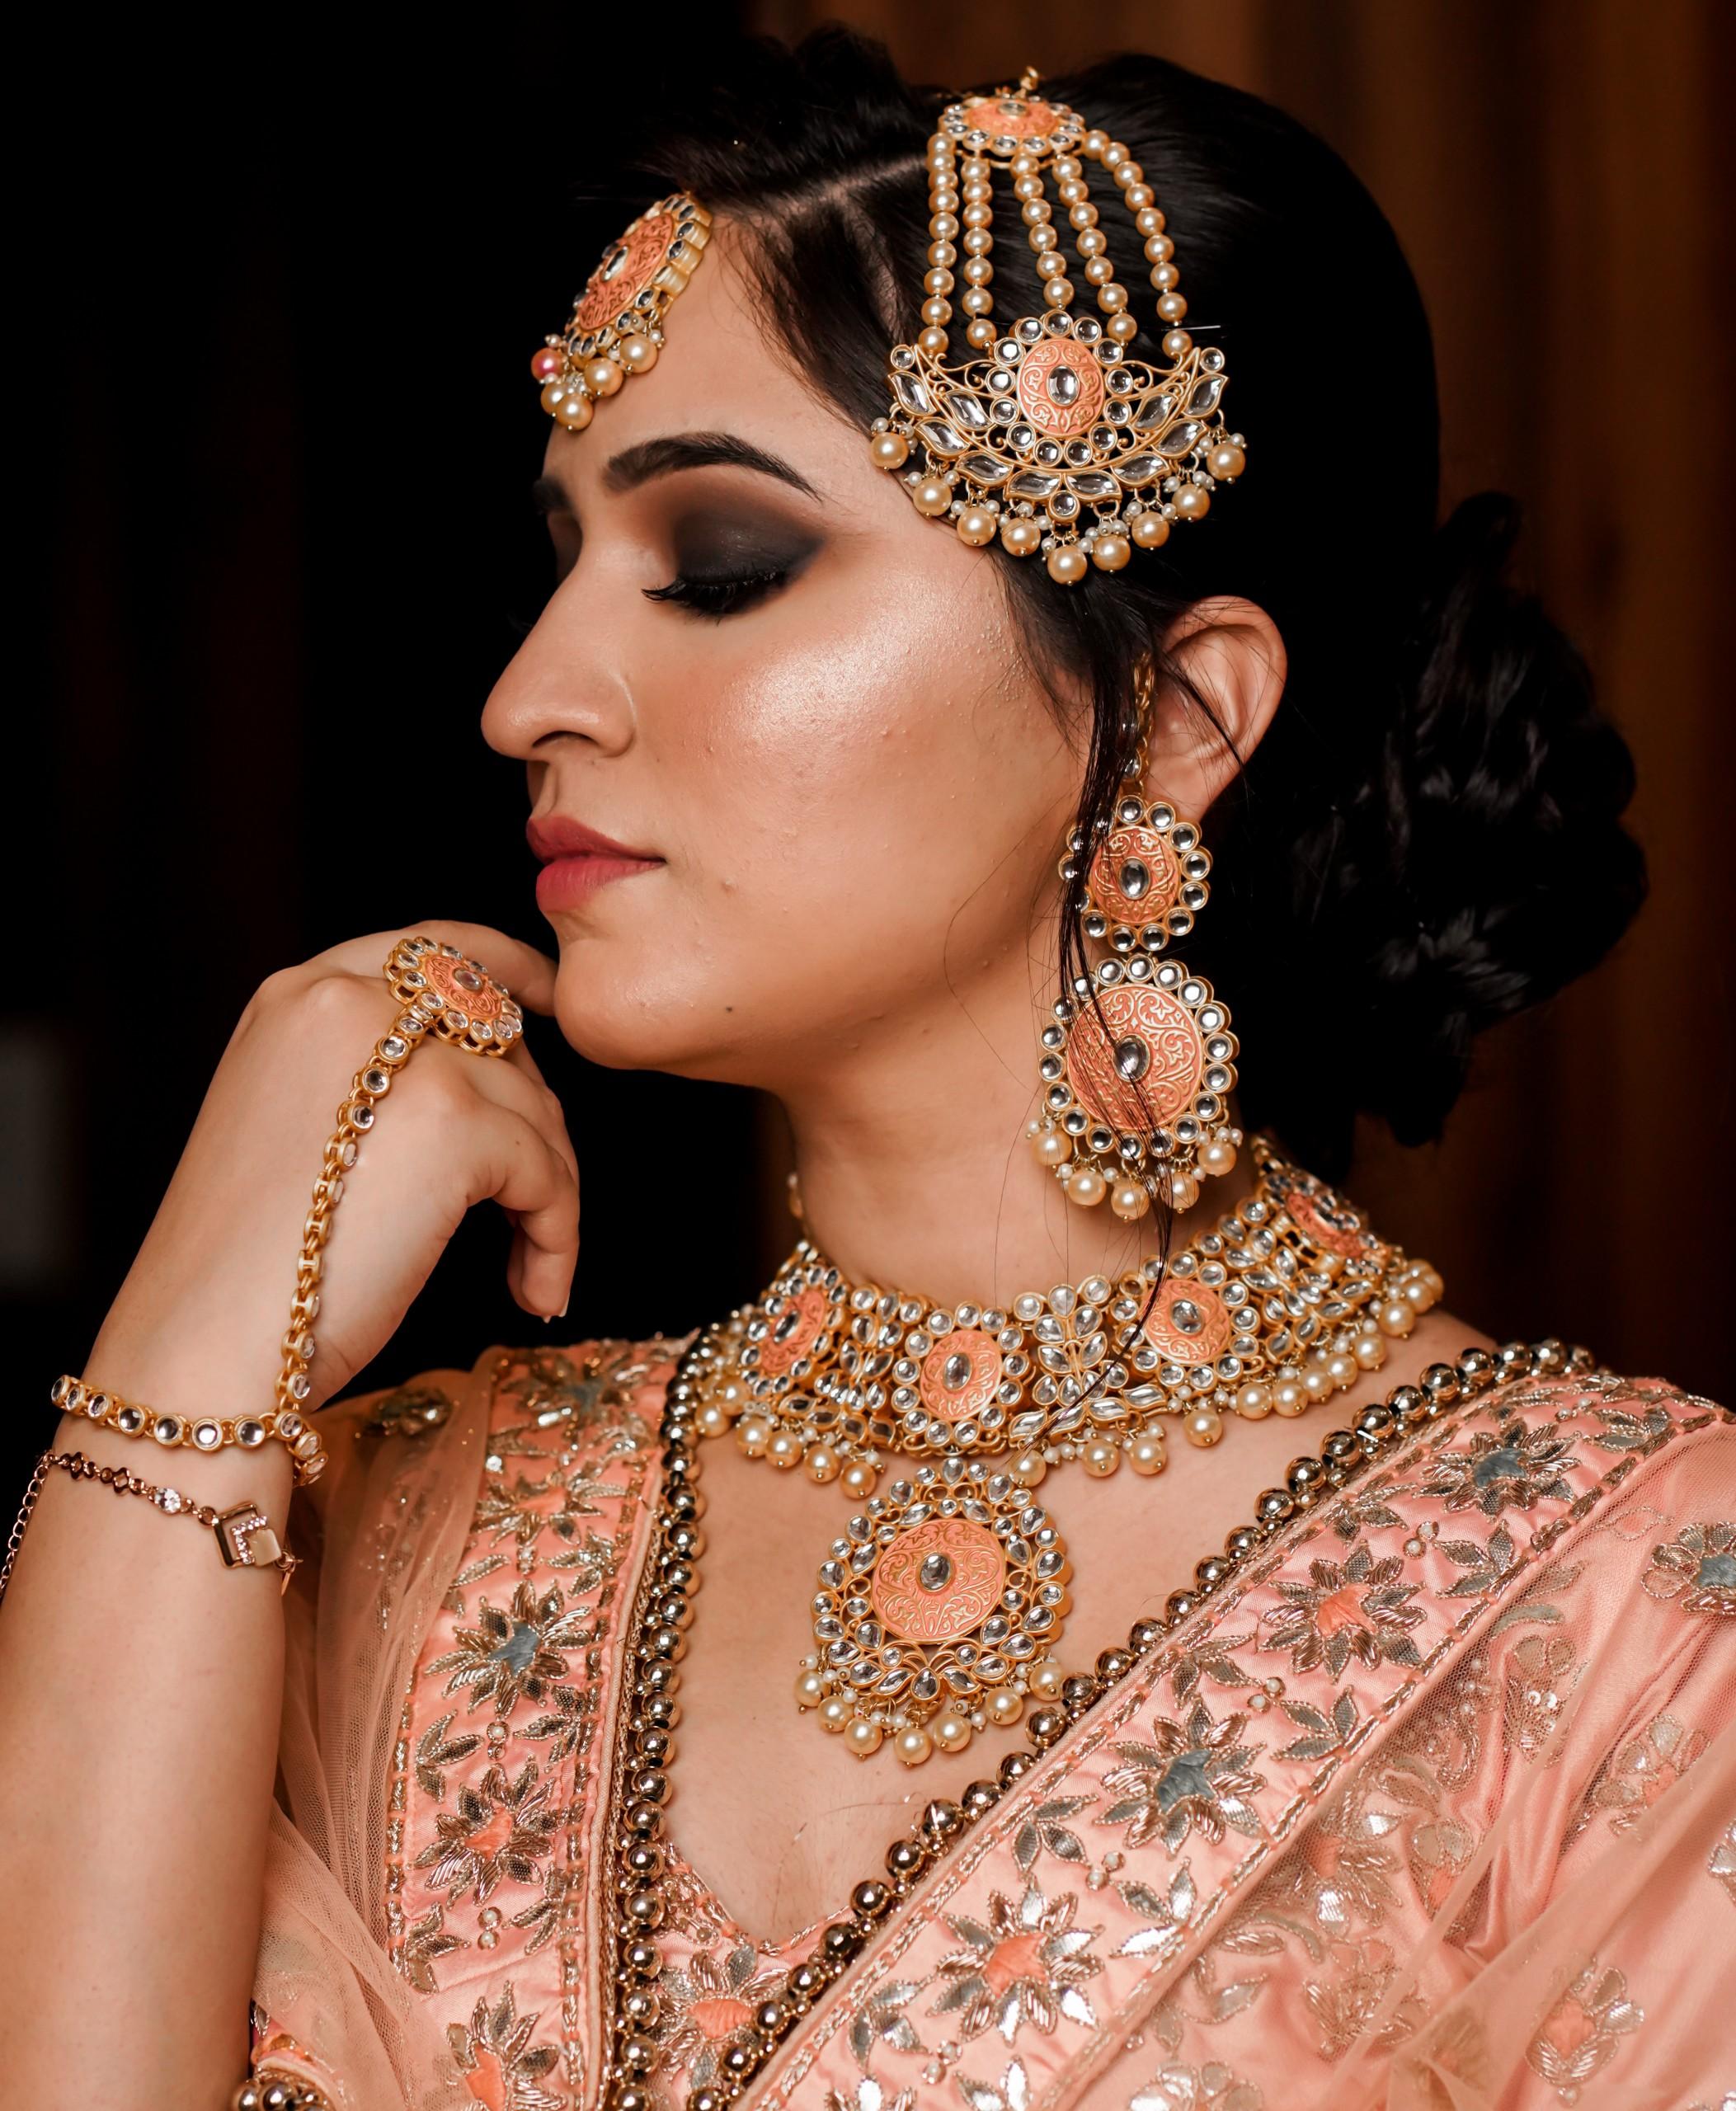 Portrait of Indian Bride